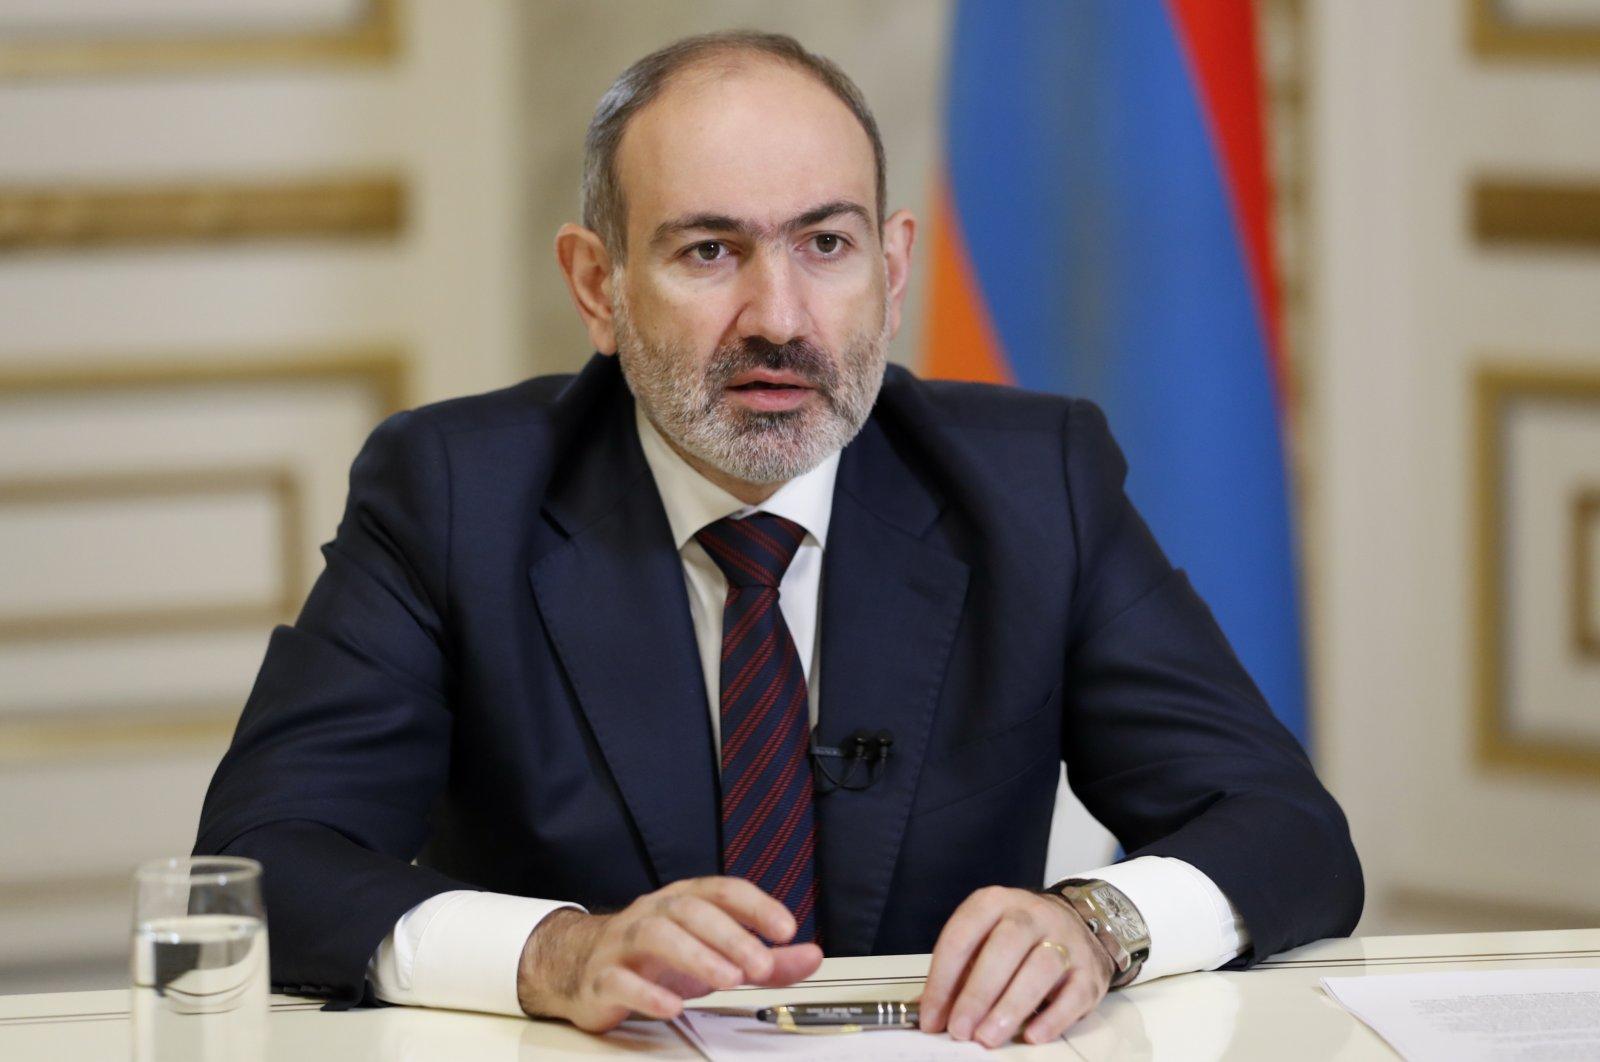 Armenian Prime Minister Nikol Pashinian addresses the nation in Yerevan, Armenia, Dec. 5, 2020. (AP Photo)